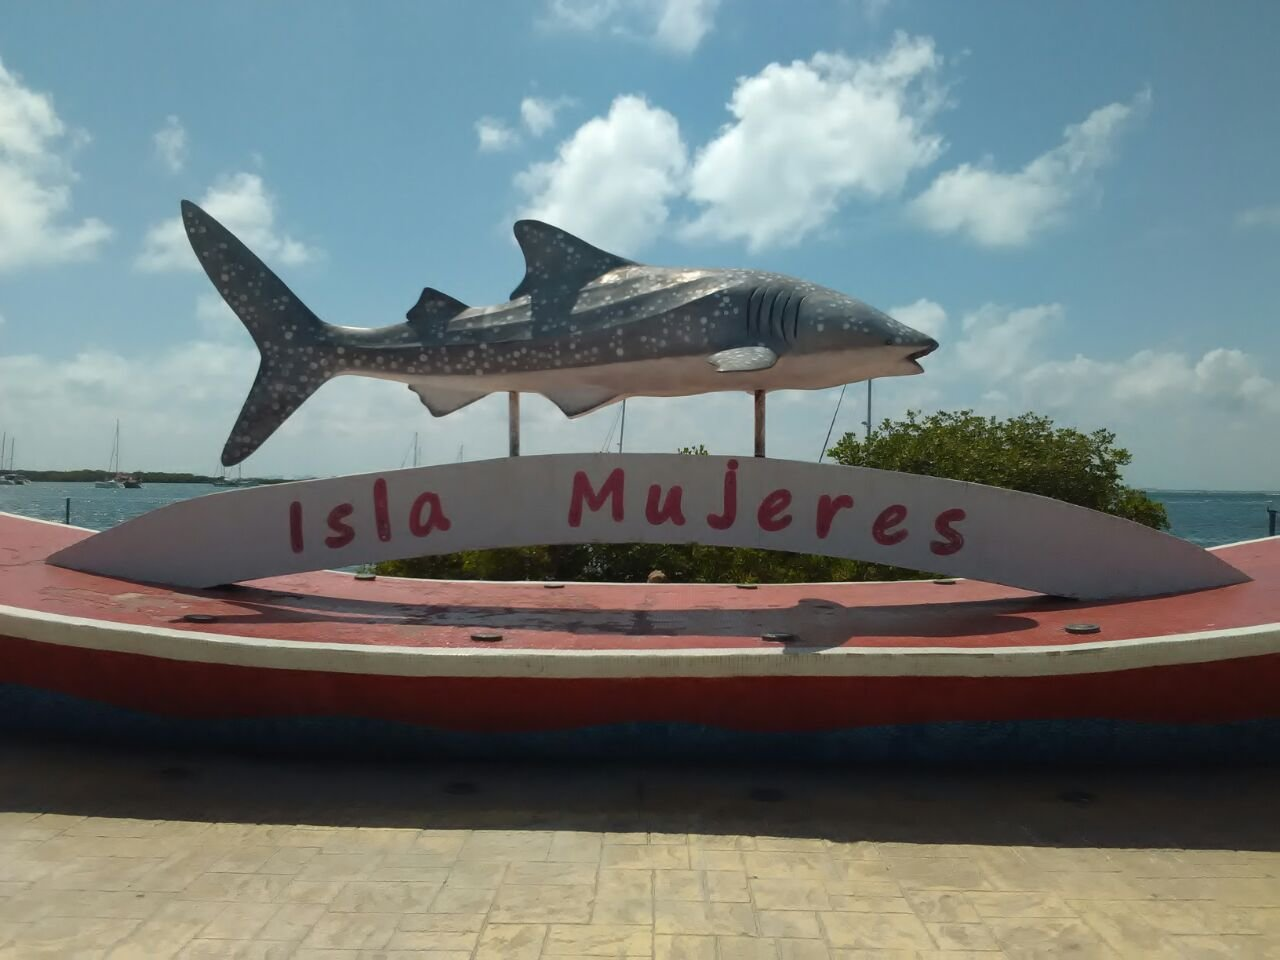 isla mujeras cool